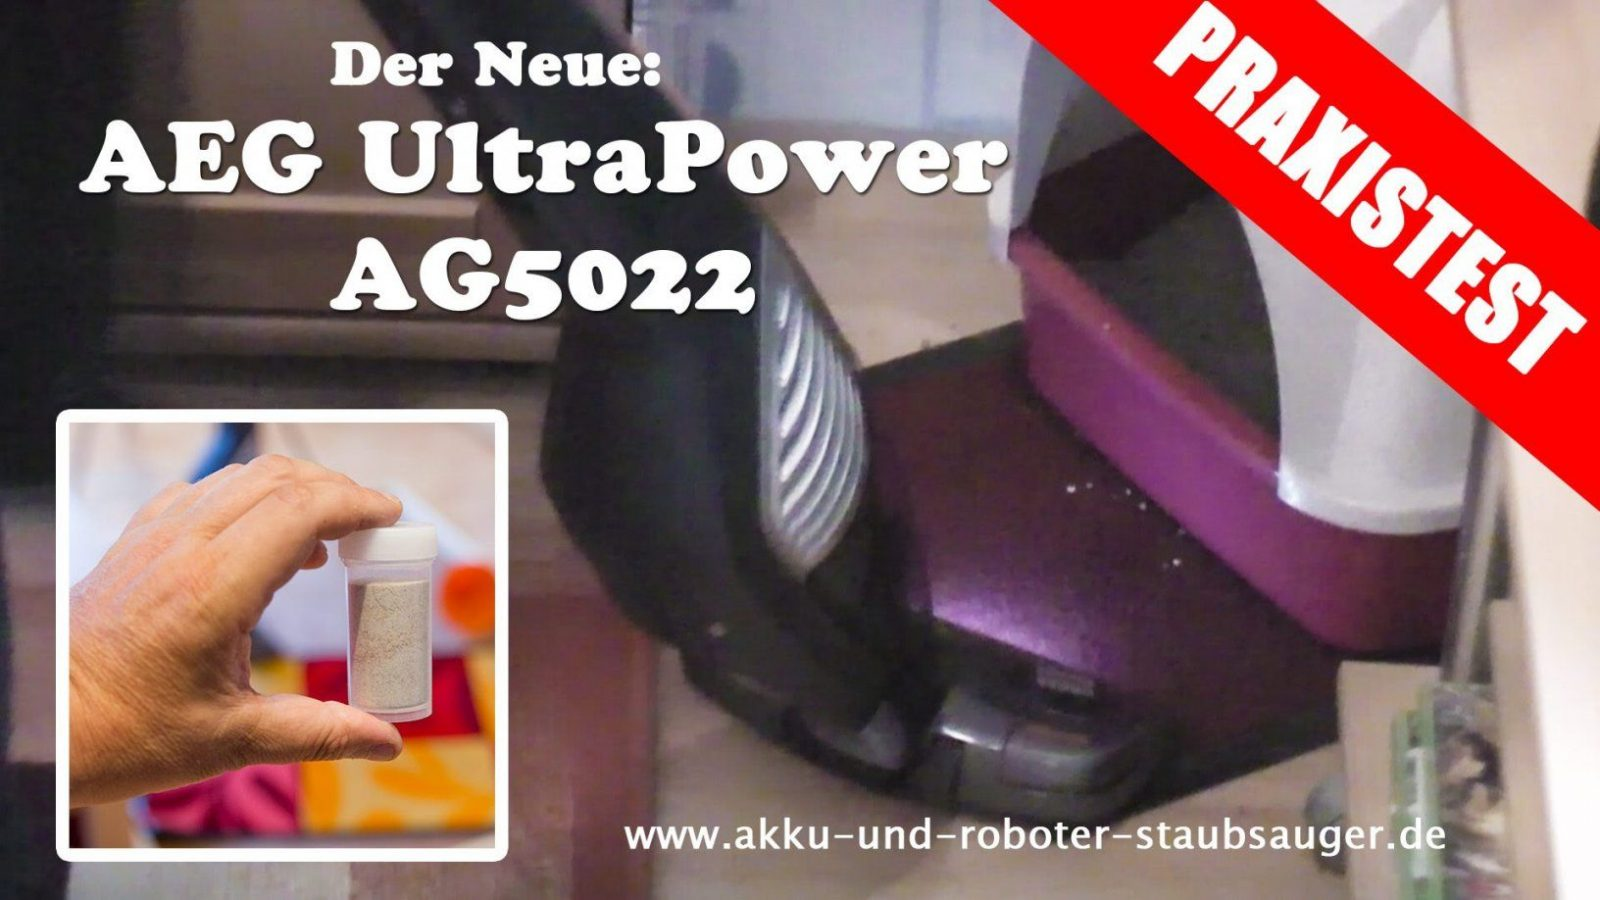 Aeg Li60 Ultrapower Ag 5022 Im Test  Praxistest  Youtube von Aeg Eco Li 60 Ultrapower Bild